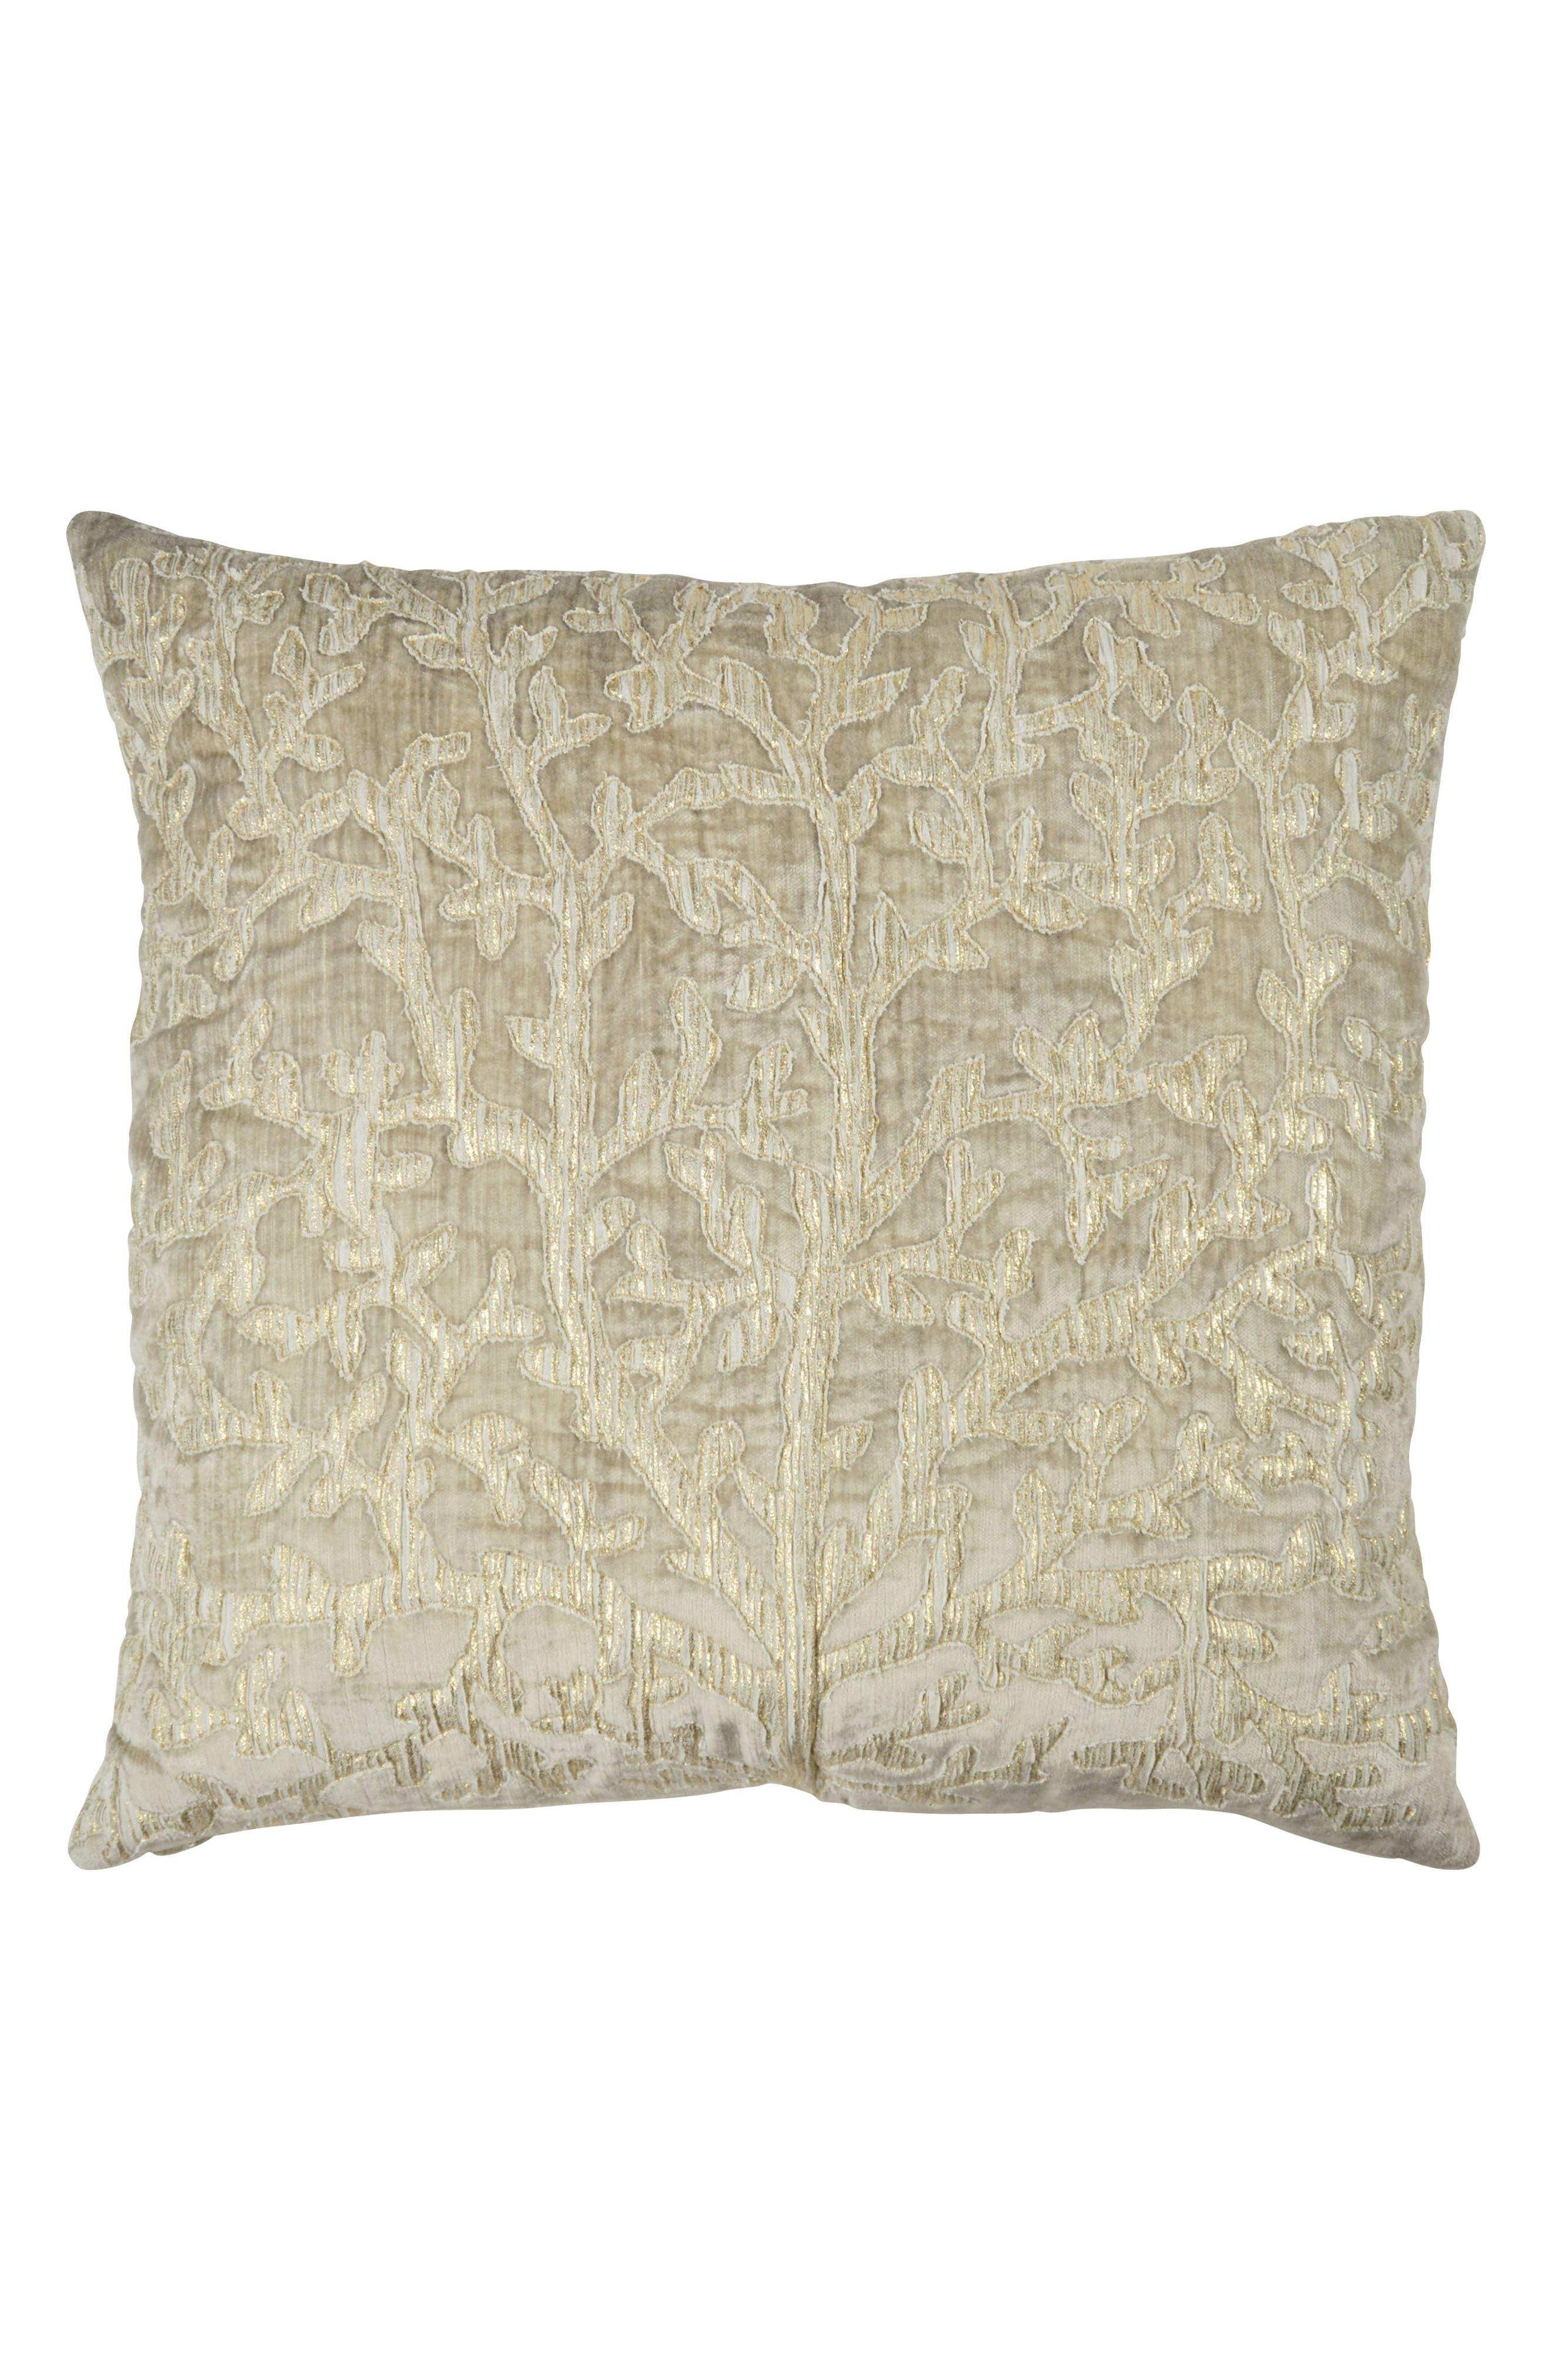 Alternate Image 1 Selected - Michael Aram Tree of Life Appliqué Accent Pillow